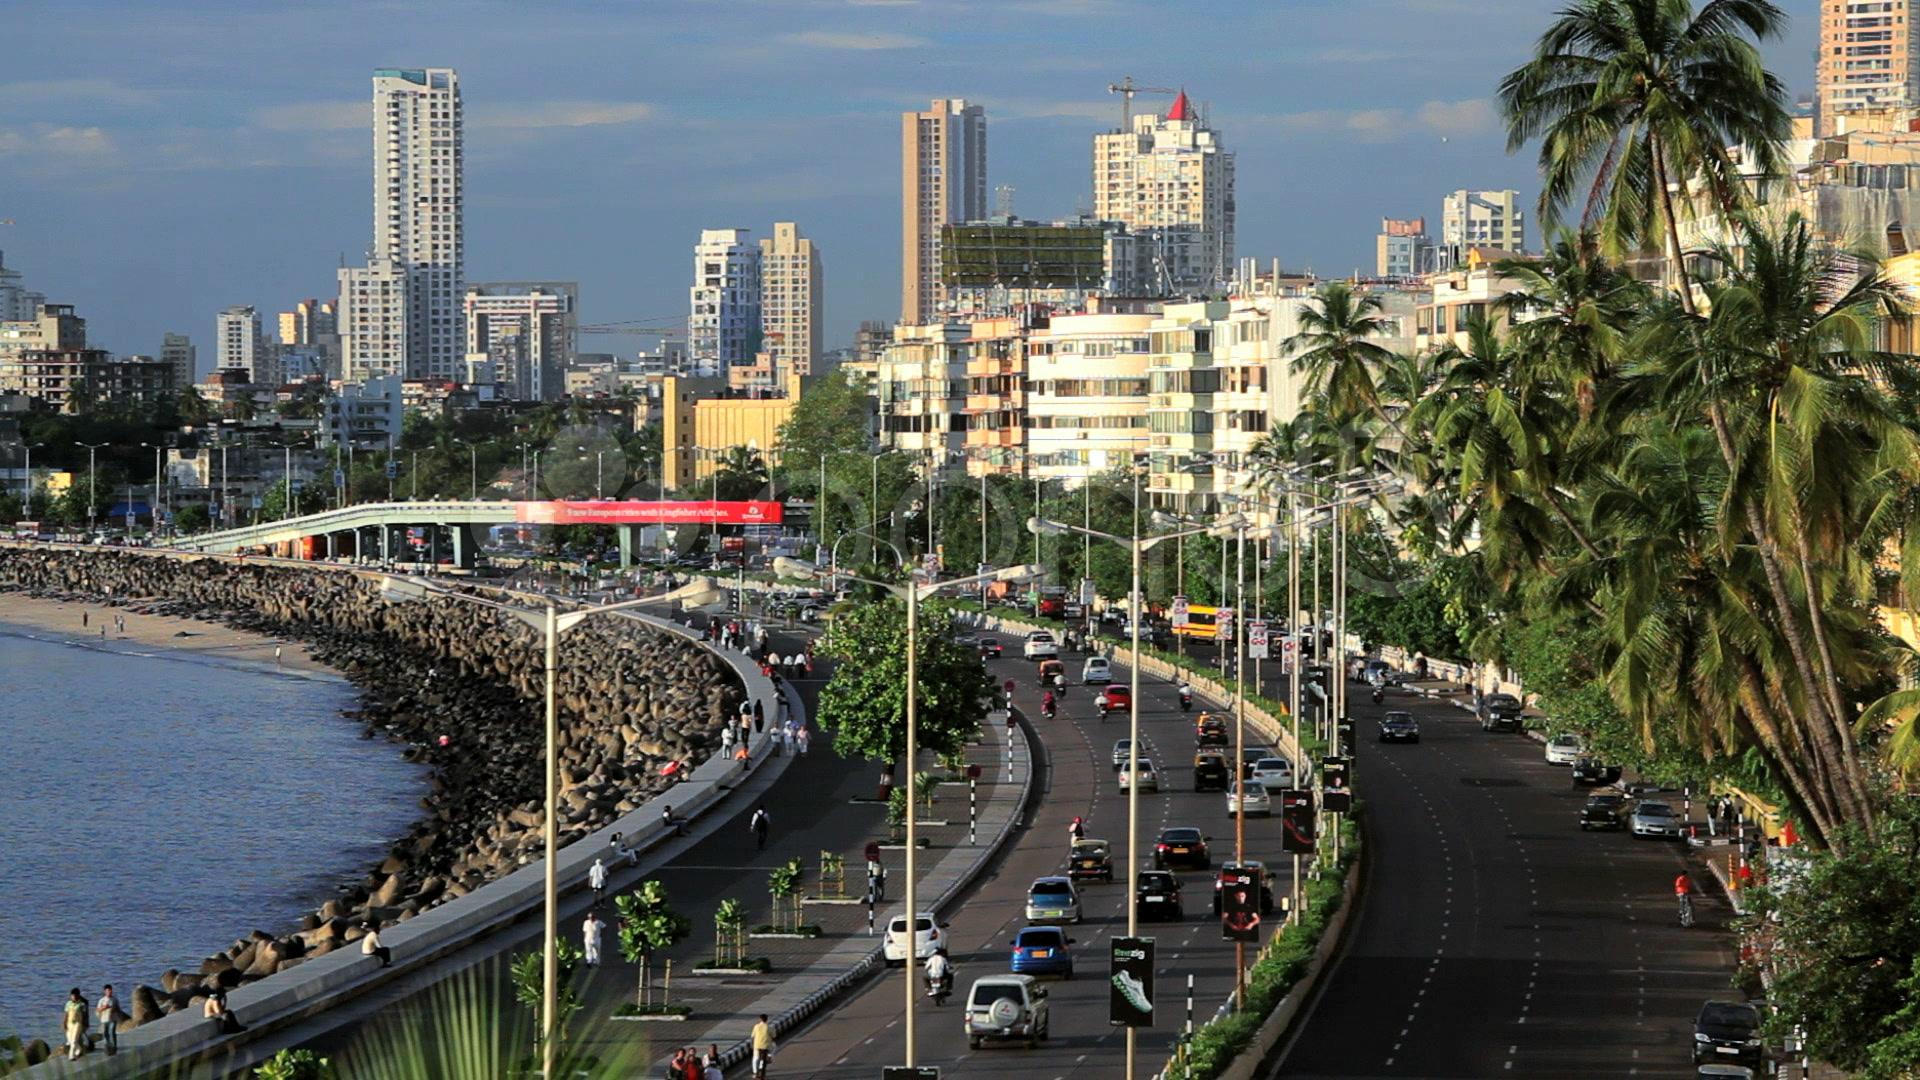 Mumbai City Wallpaper Hd Beach And Marine Drive With The Skyline Of Mumbai City In